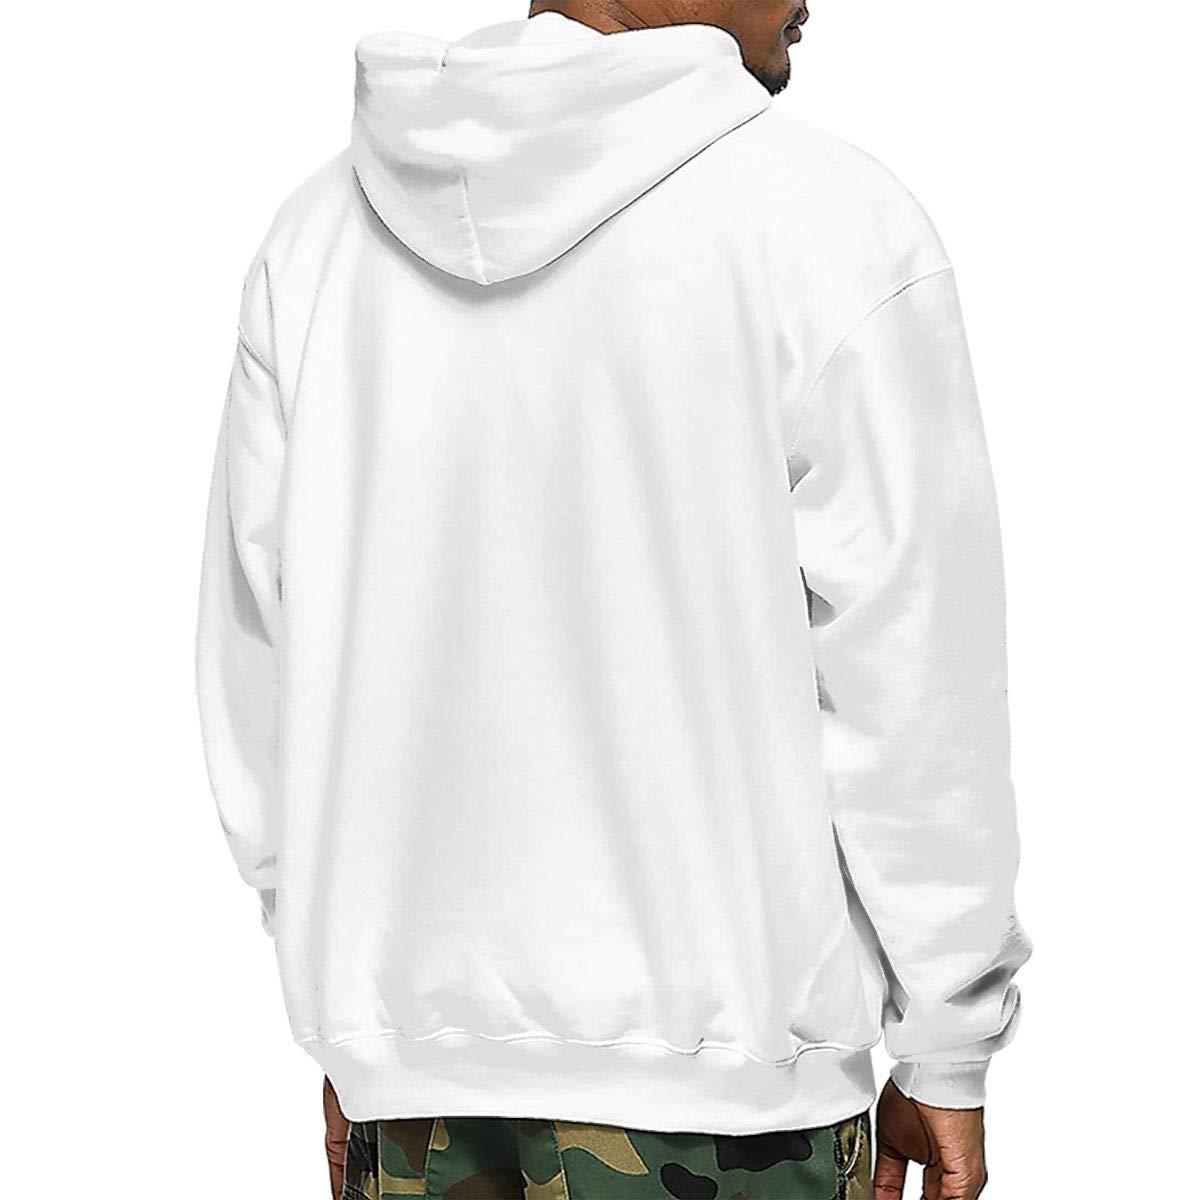 Opanjyajk The Monkees Headquarters Mens Pullover Hooded Sweatshirt